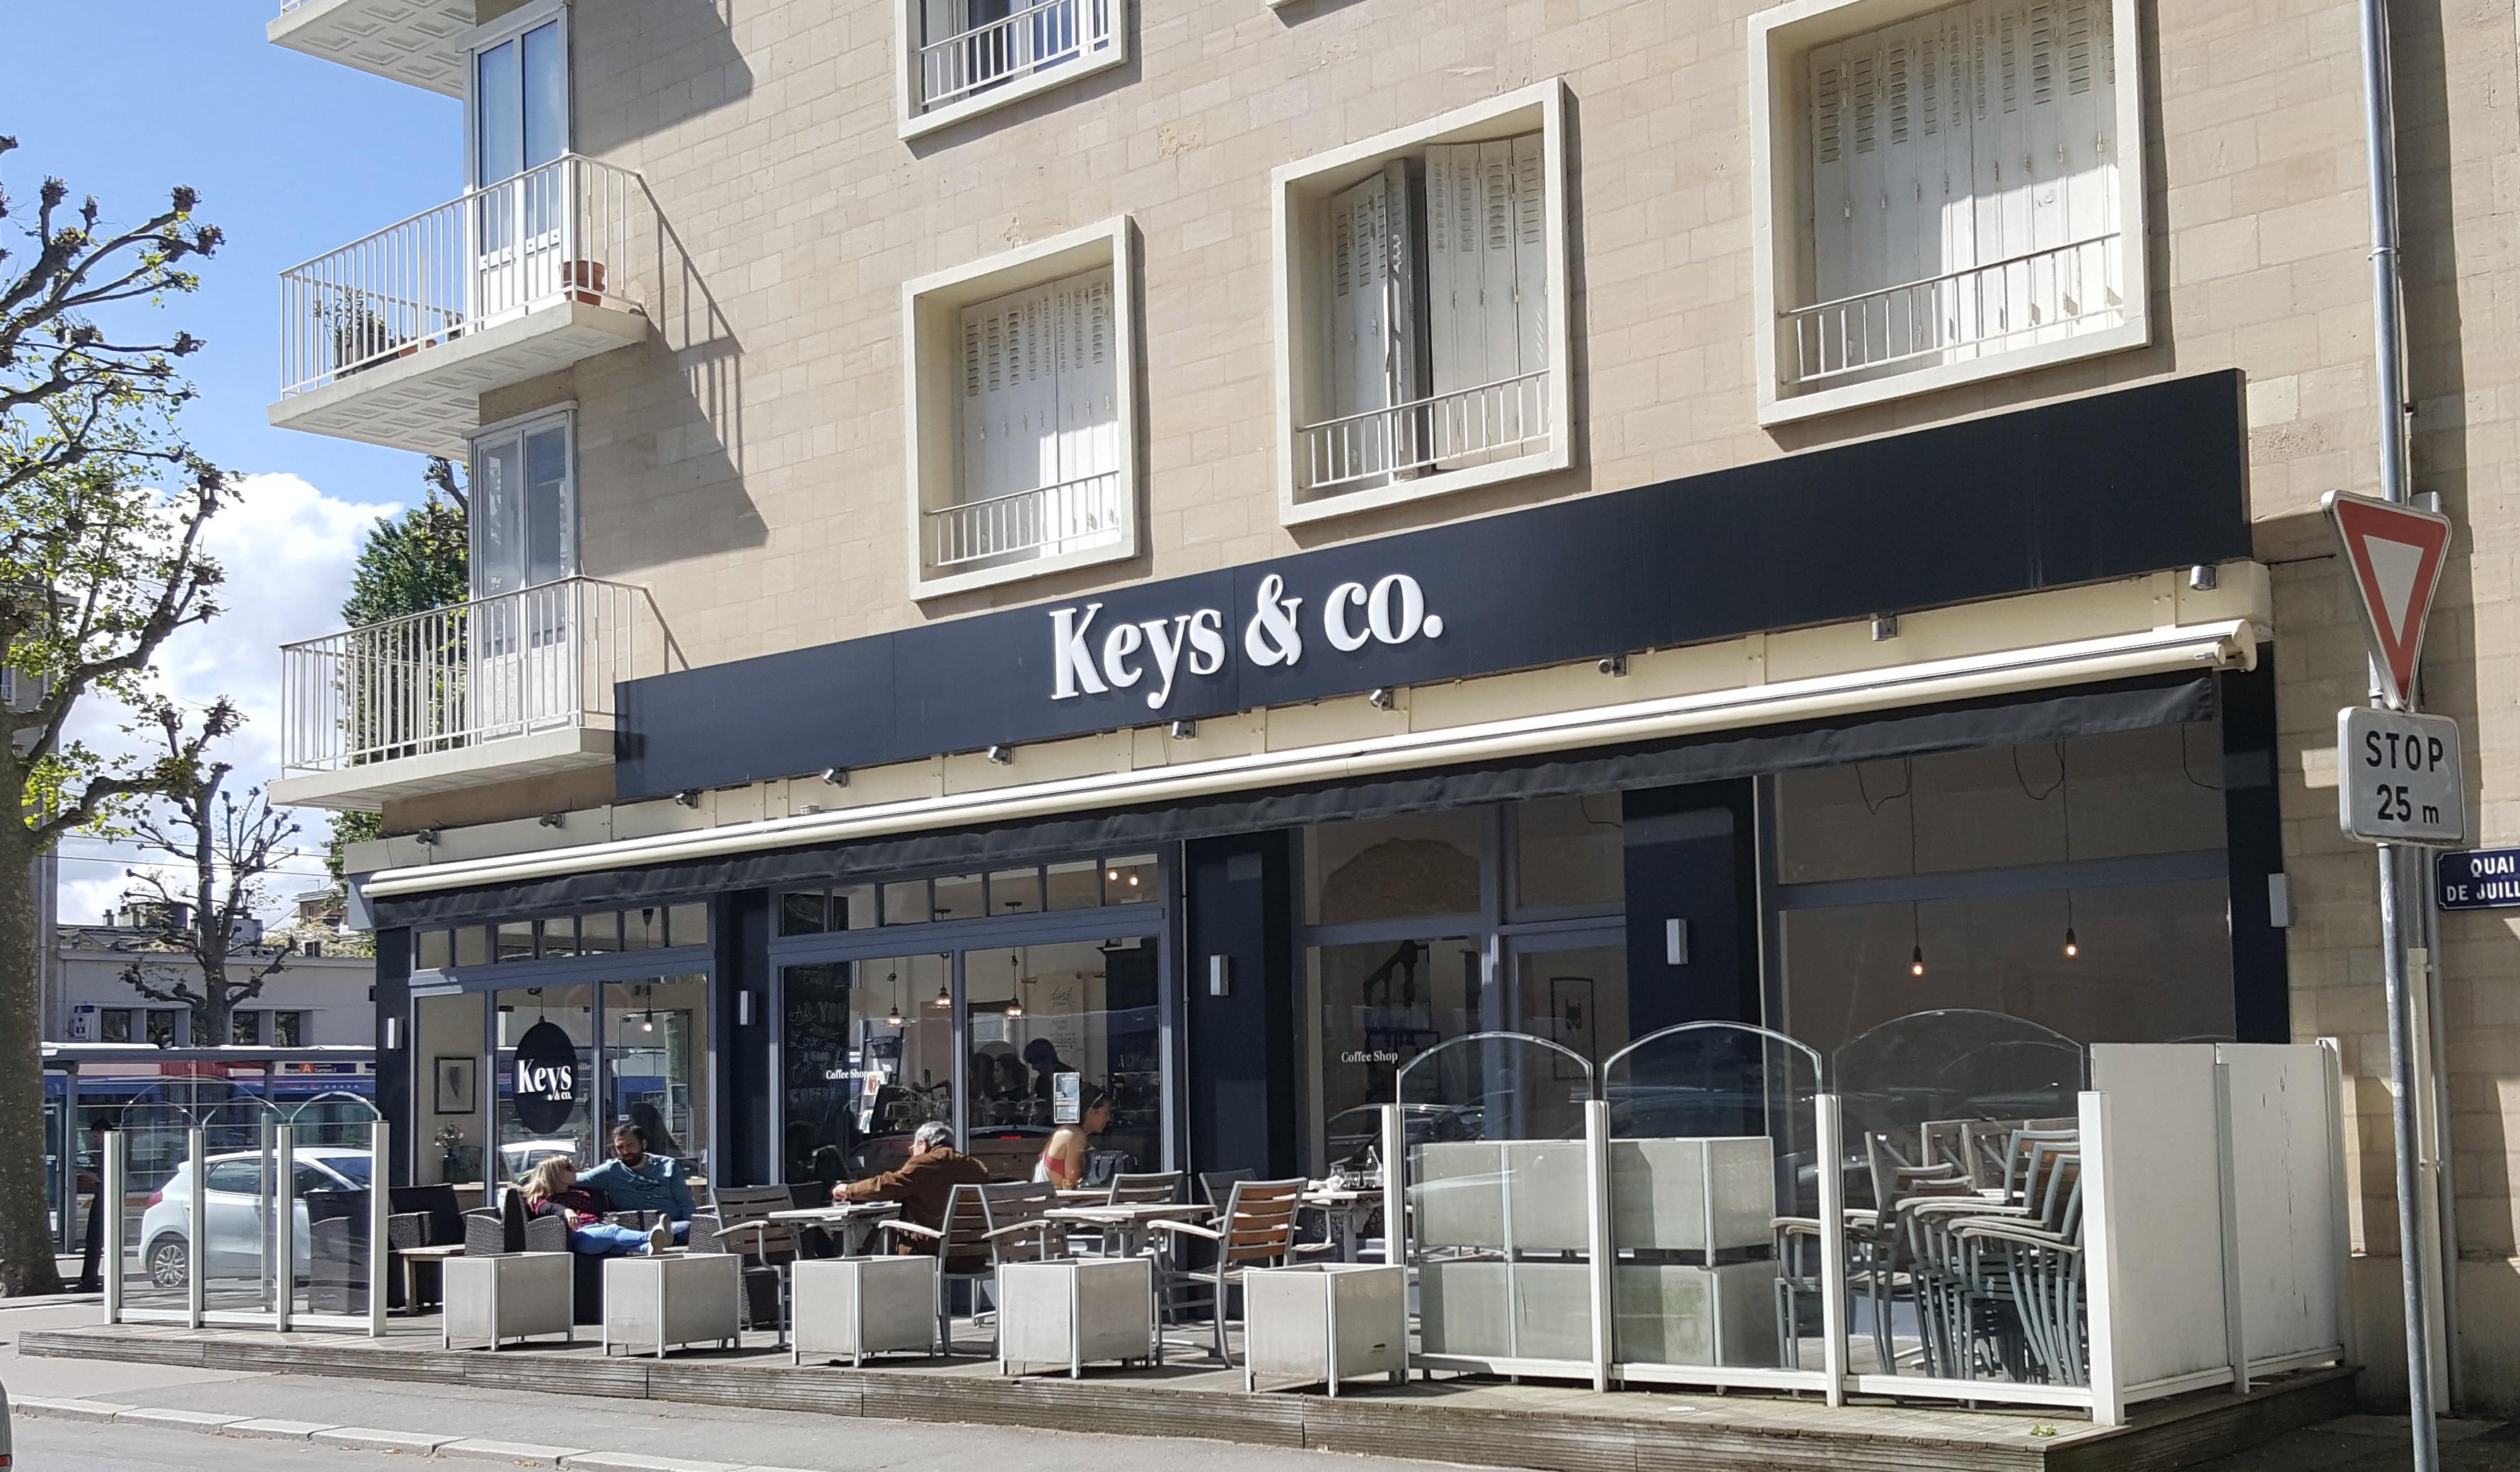 Keys co caen coffee shop tendance et gourmand for Garage ouvert le dimanche caen